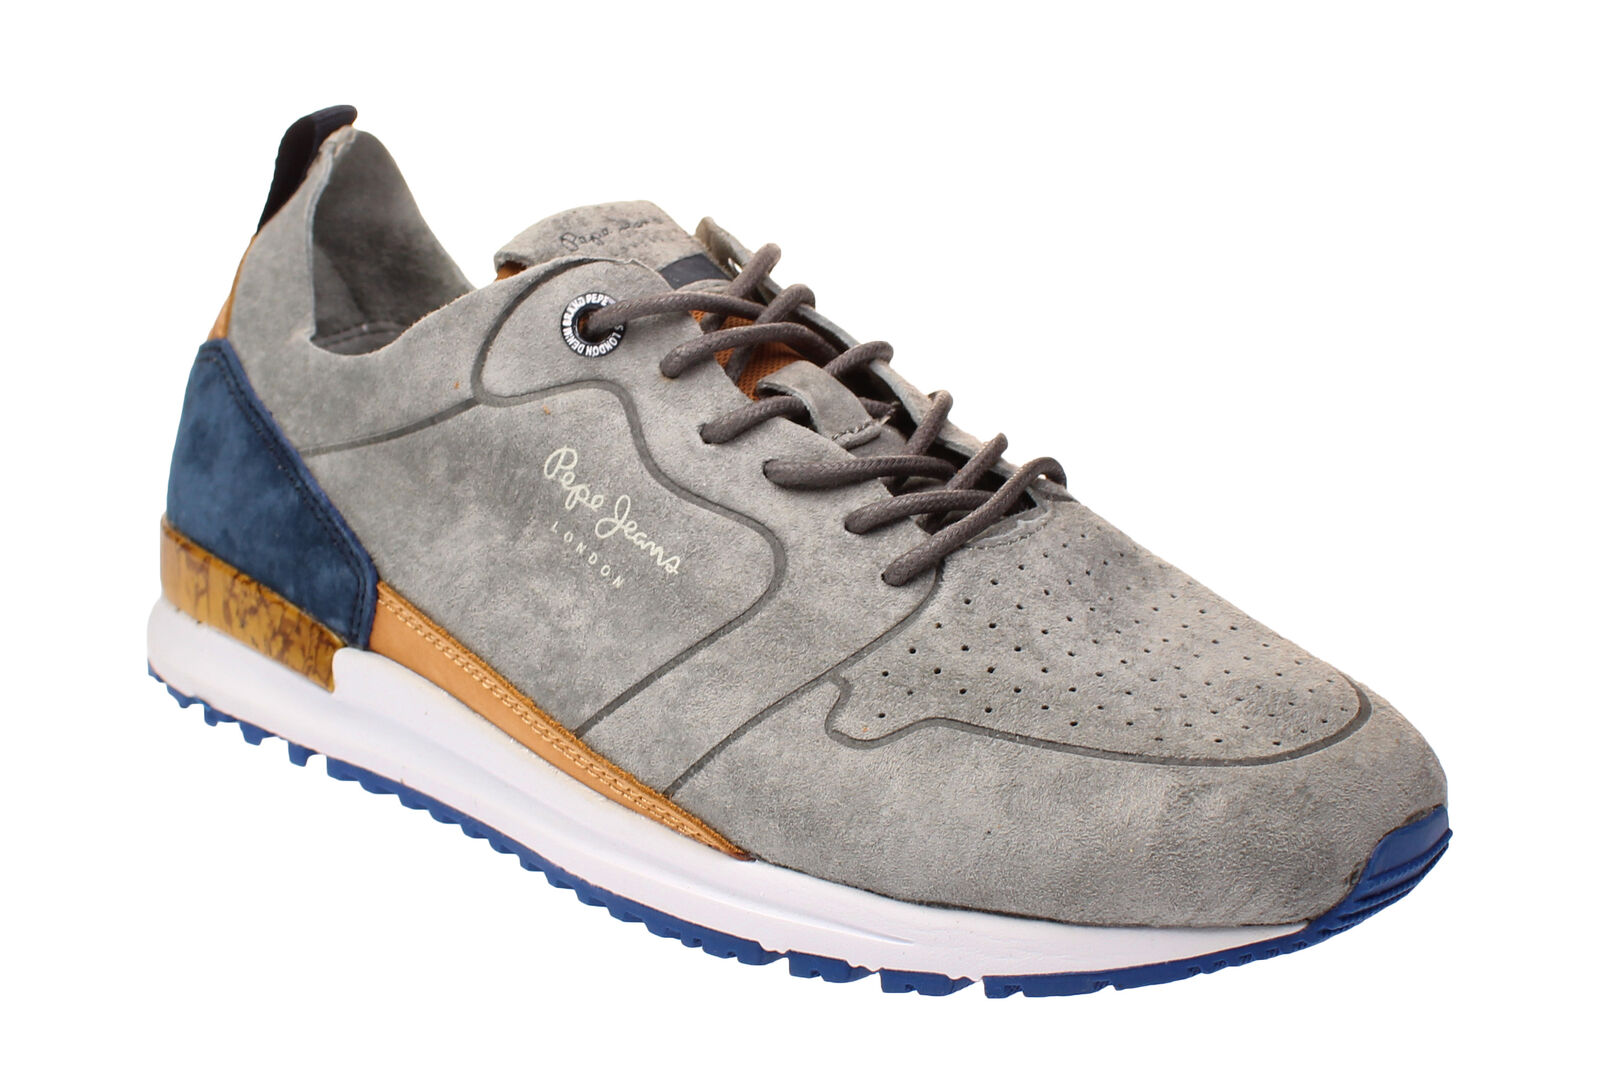 Pepe Herren Jeans PMS30411 TINKER - Herren Pepe Schuhe Sneaker - 945-Grau 69f6db